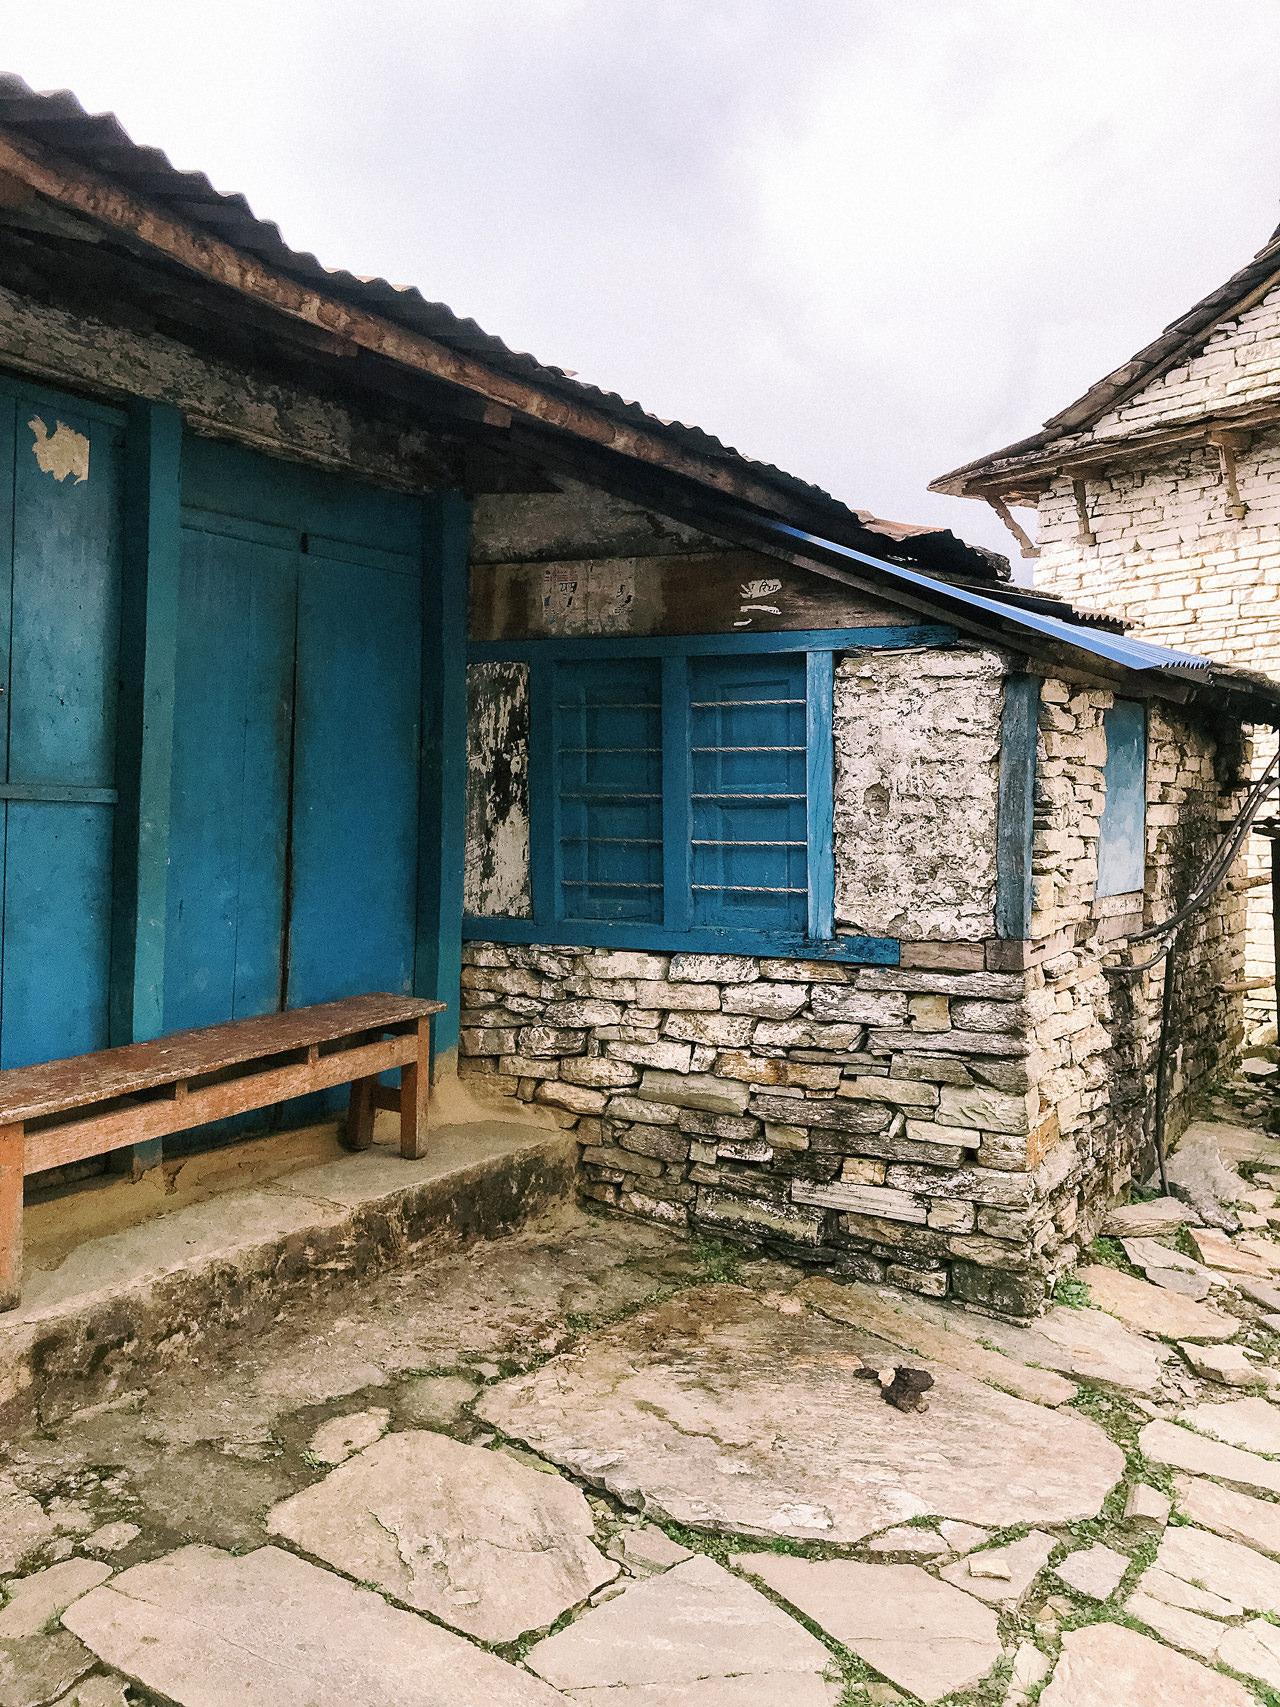 Nepal 2019 - Trekking Annapurna Base Camp 47